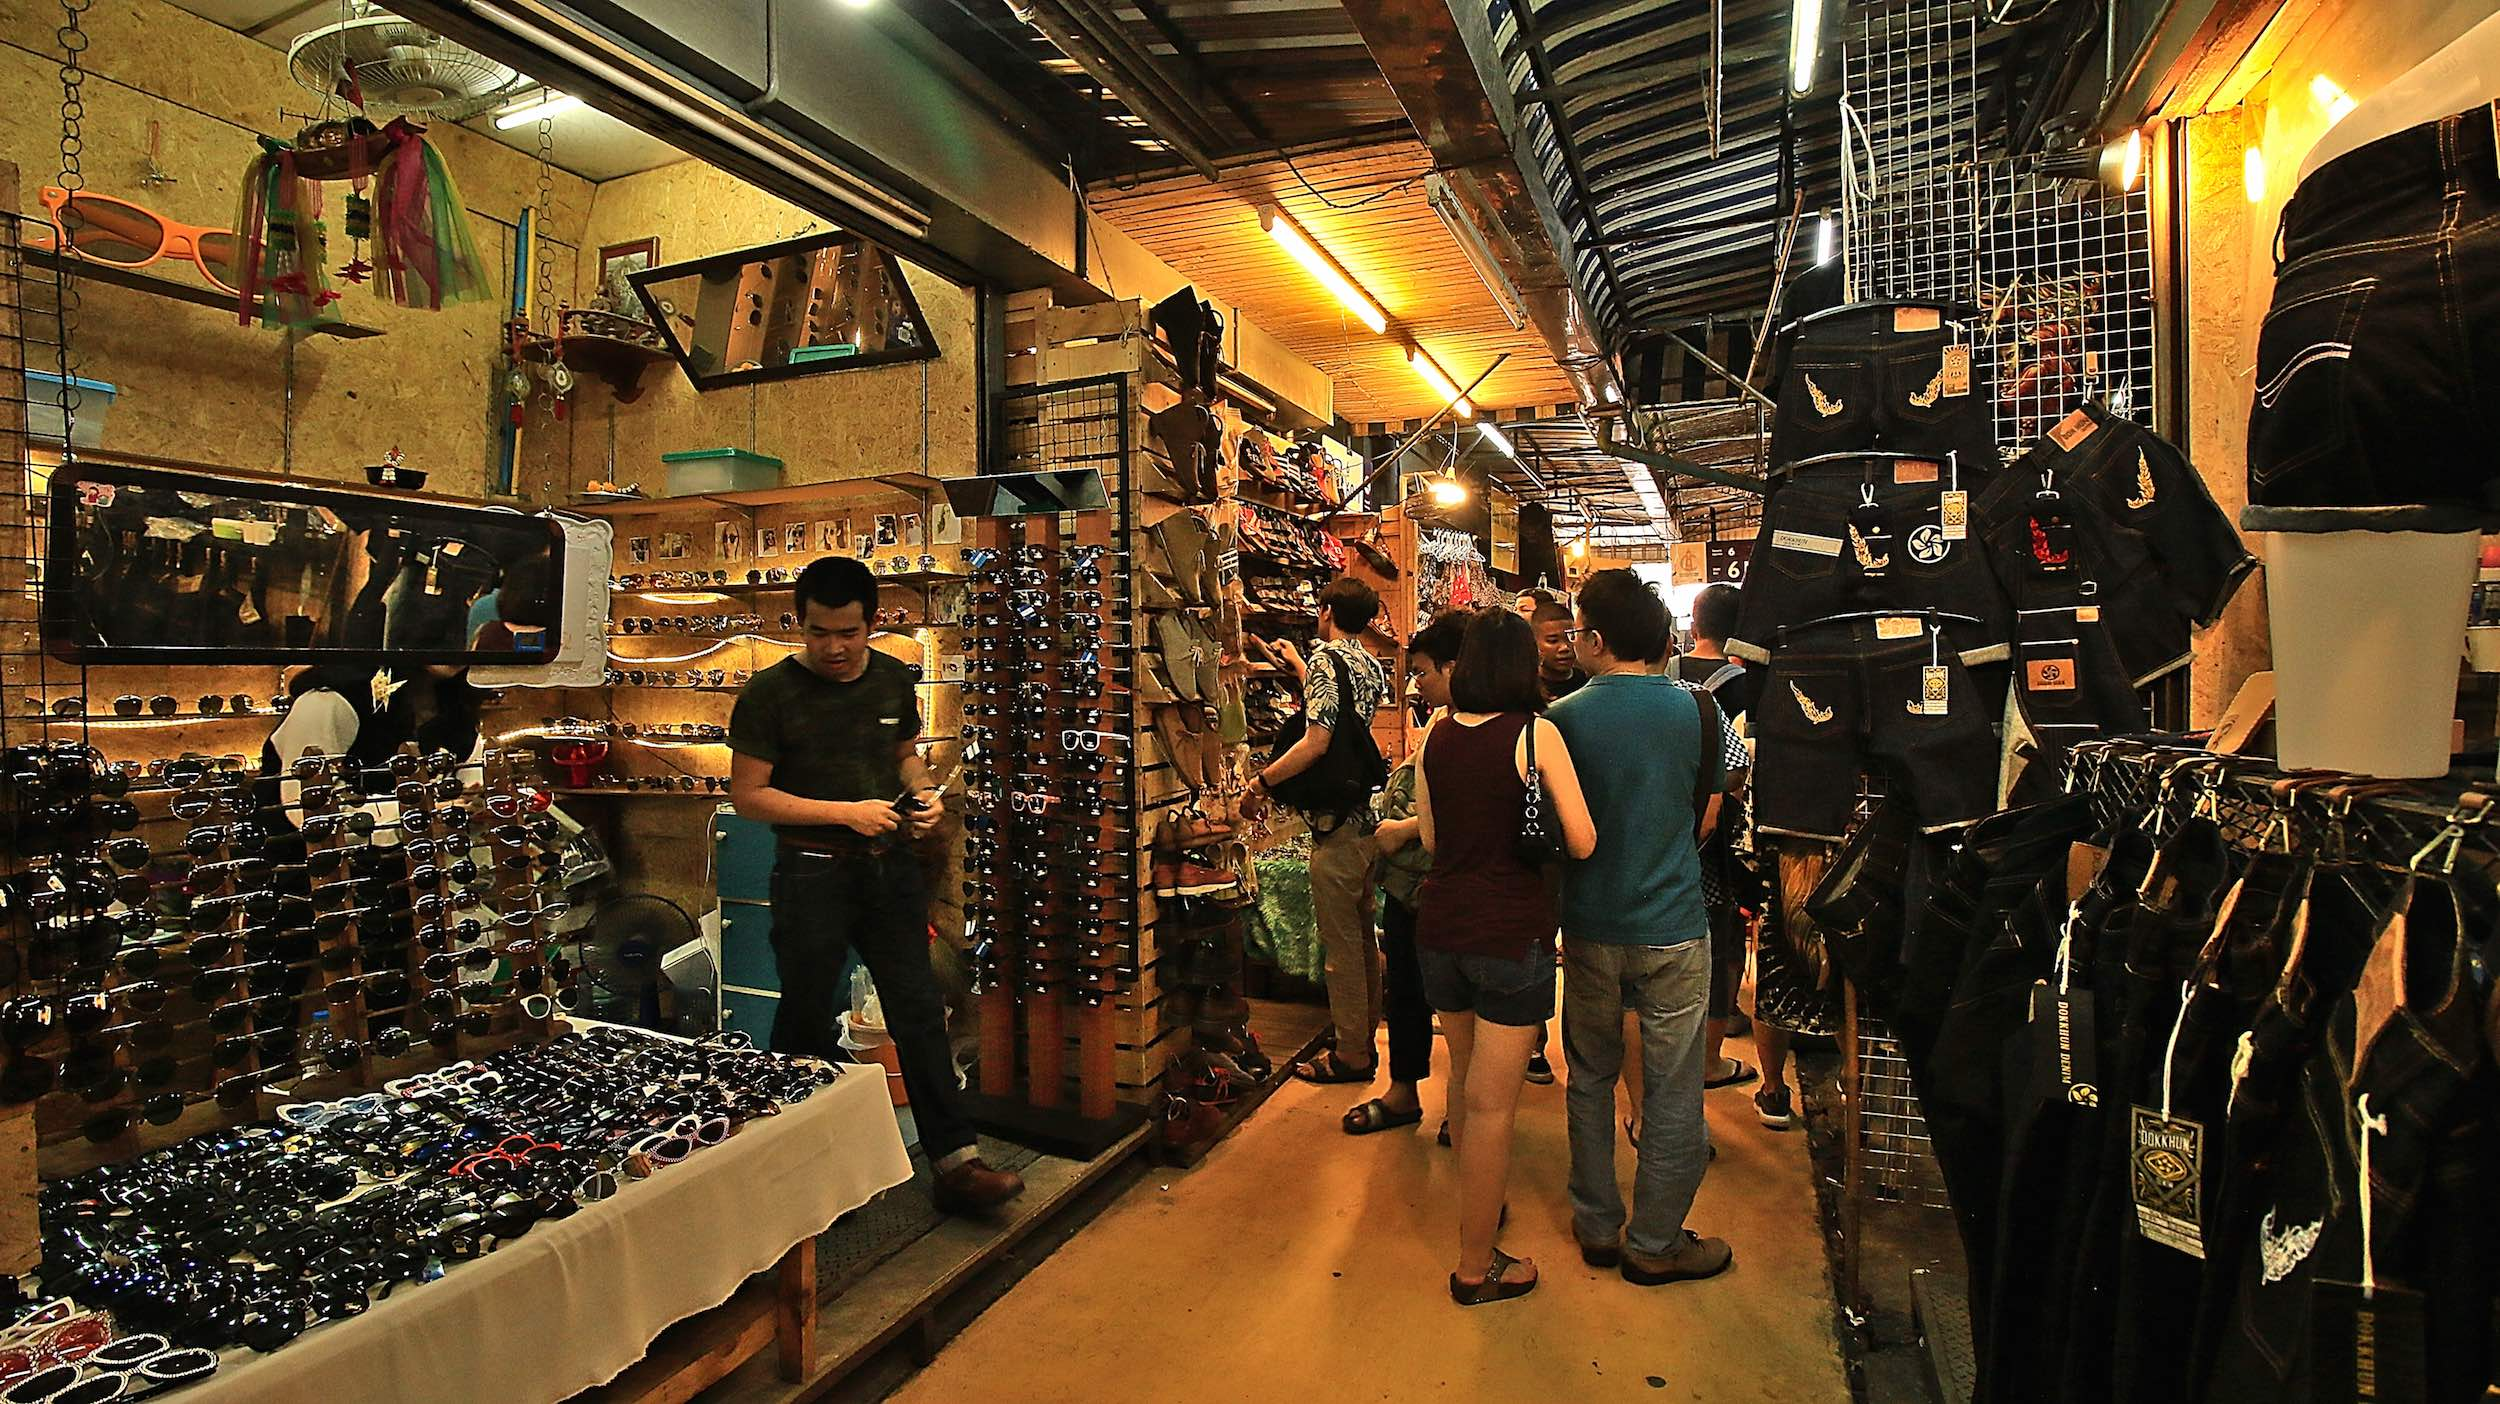 Chatuchak_Weekend_Market_Bangkok_Sunglasses_Jeans.jpg